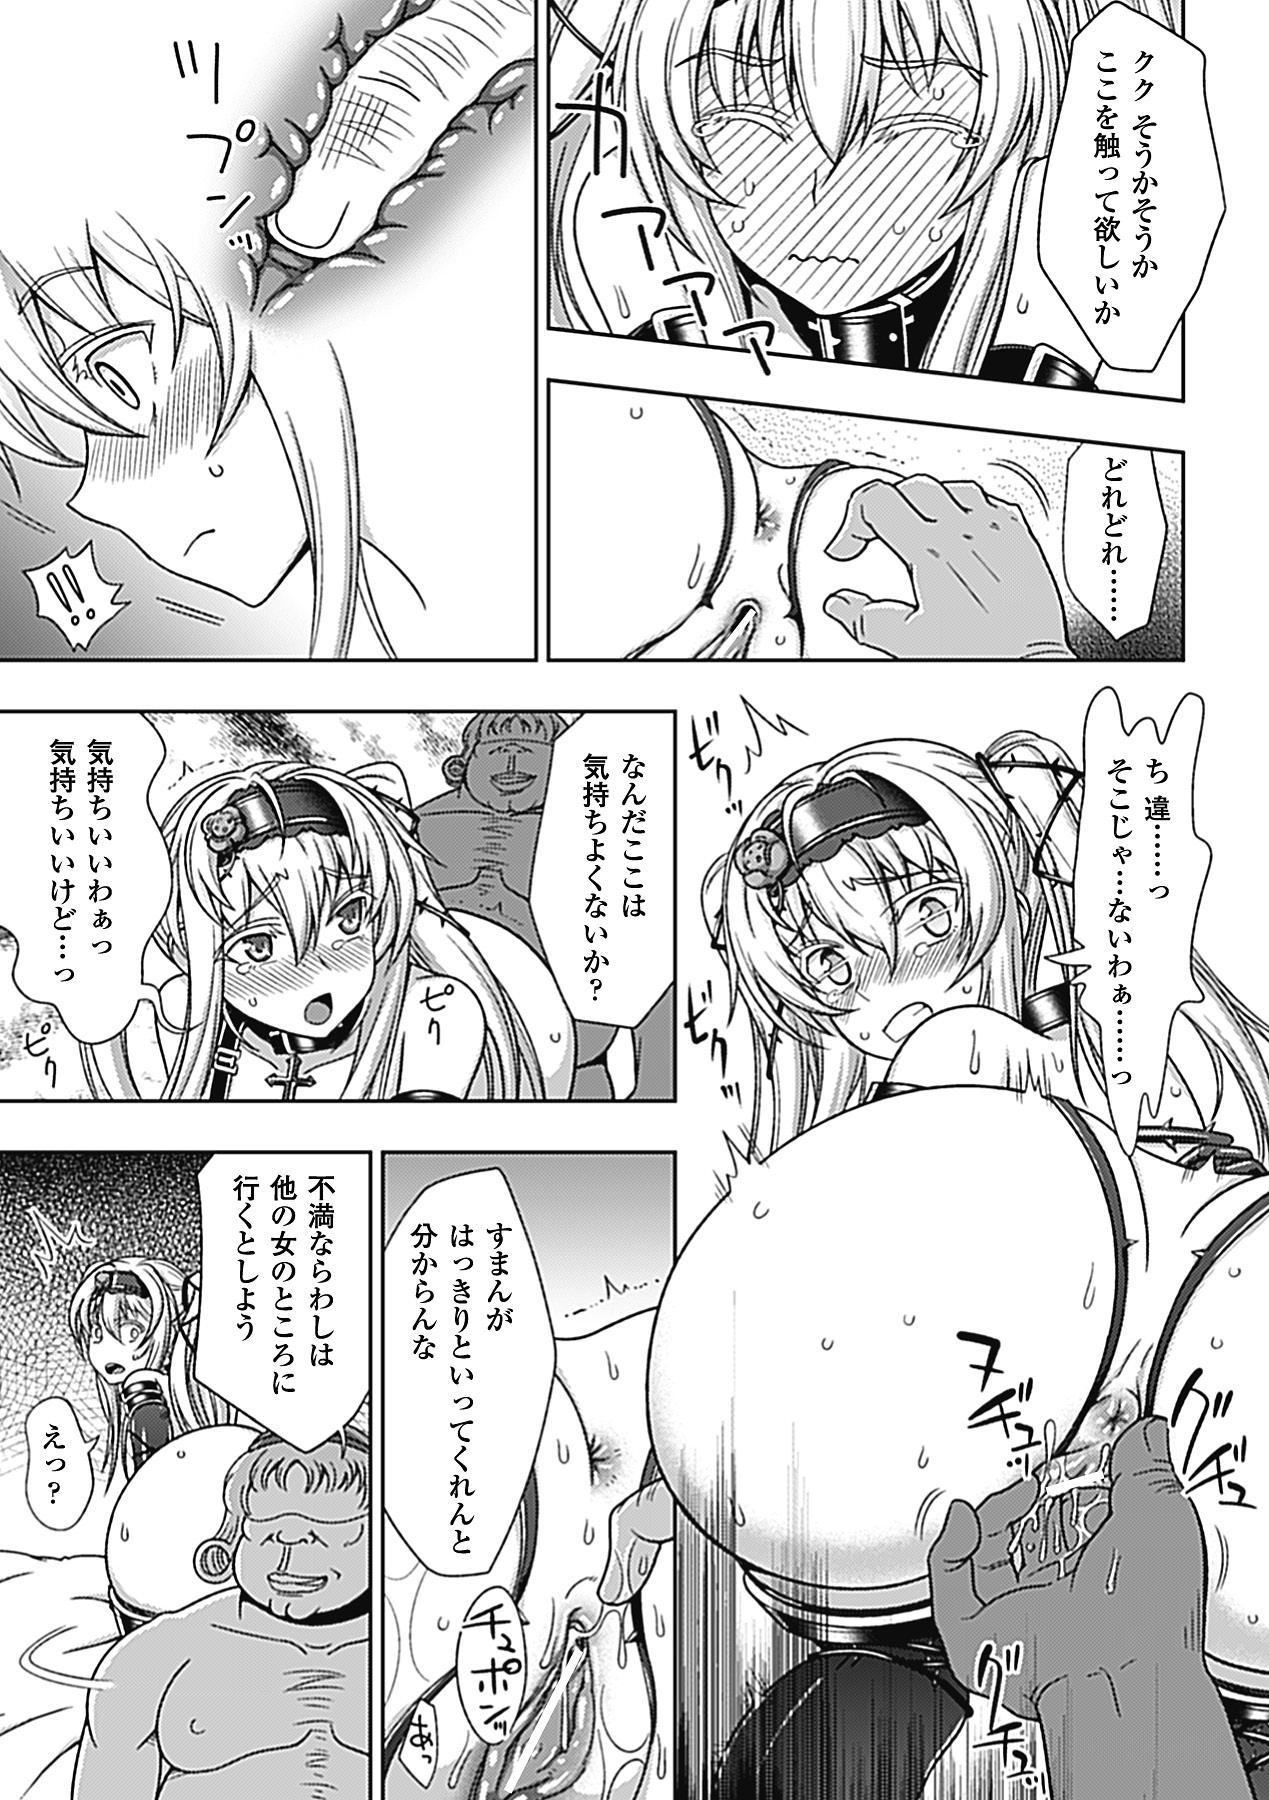 Megami Crisis 1 37